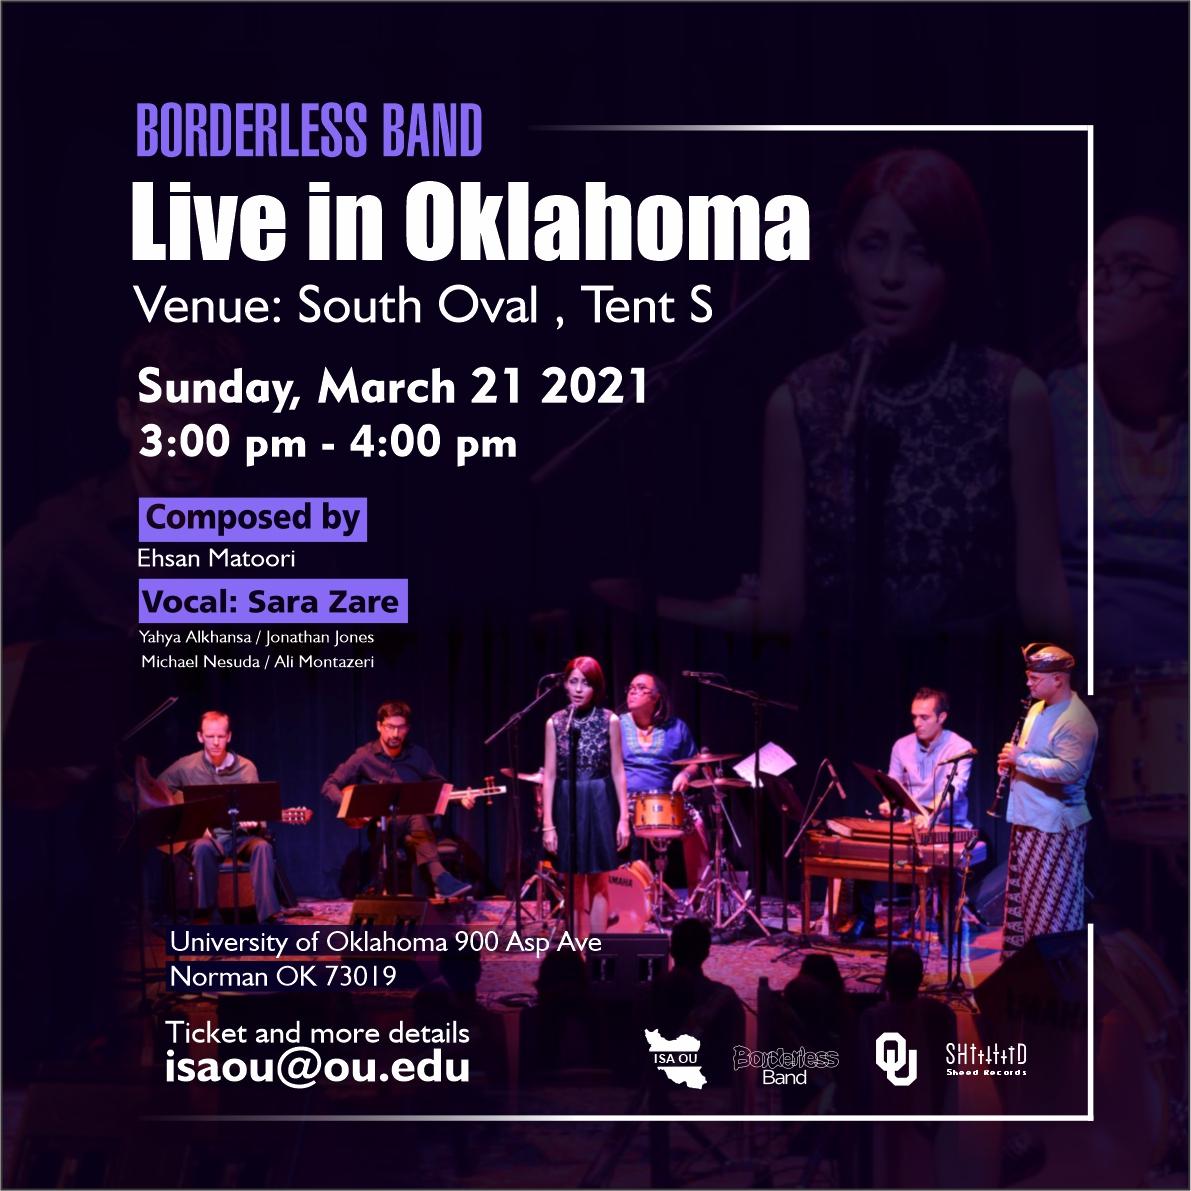 Borderless Band Live in Oklahoma